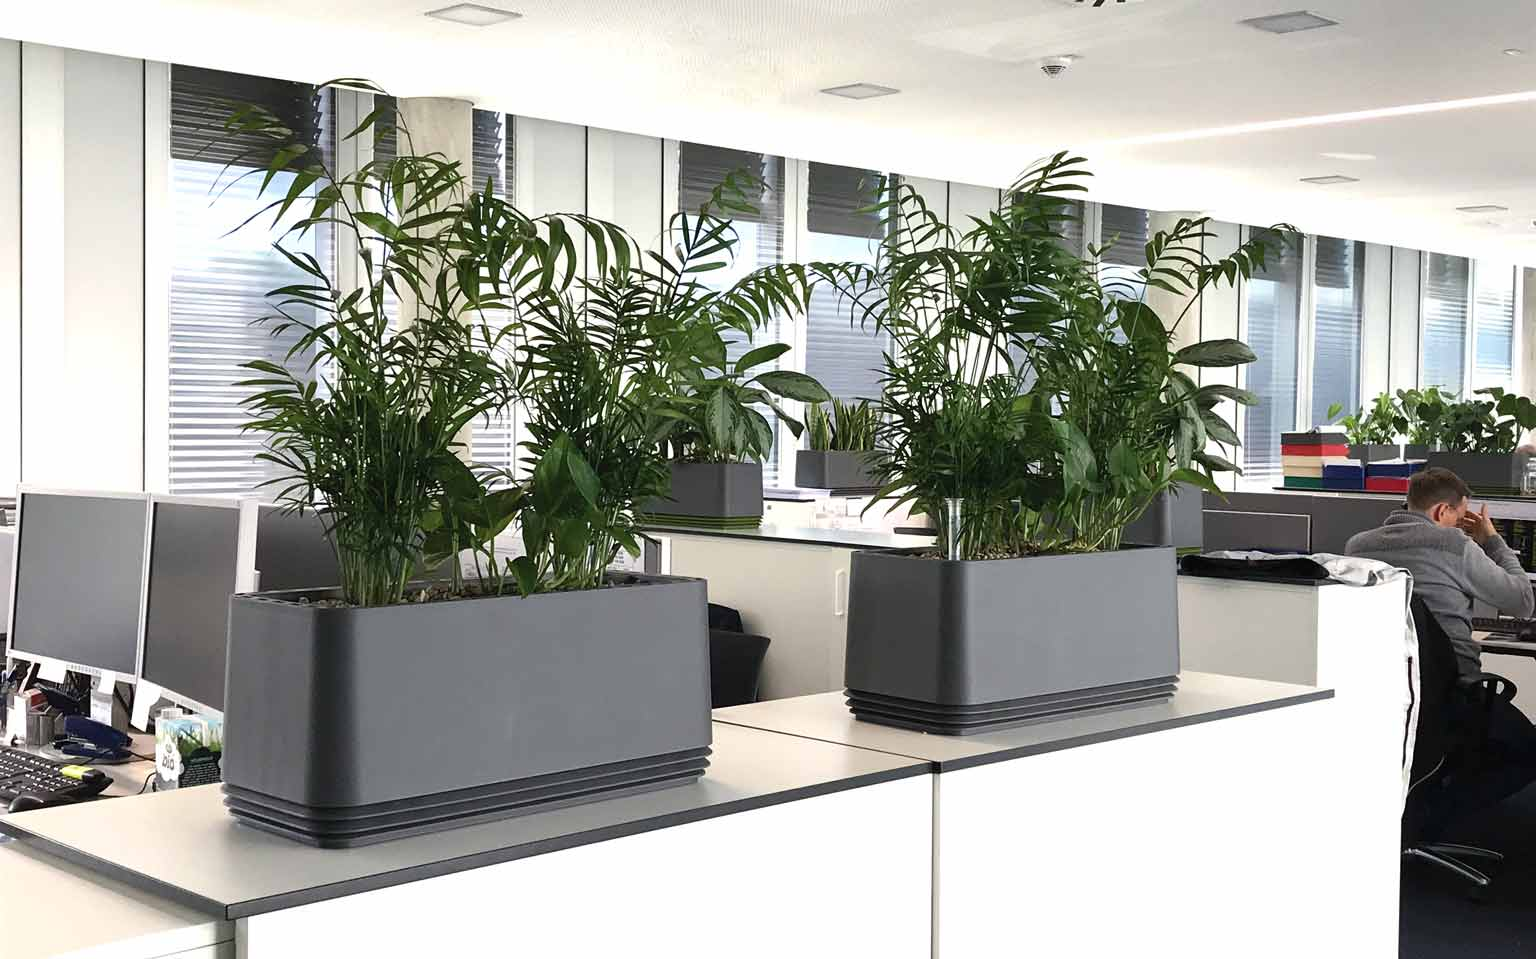 Gesunde Büroluft durch airy Blumentopf